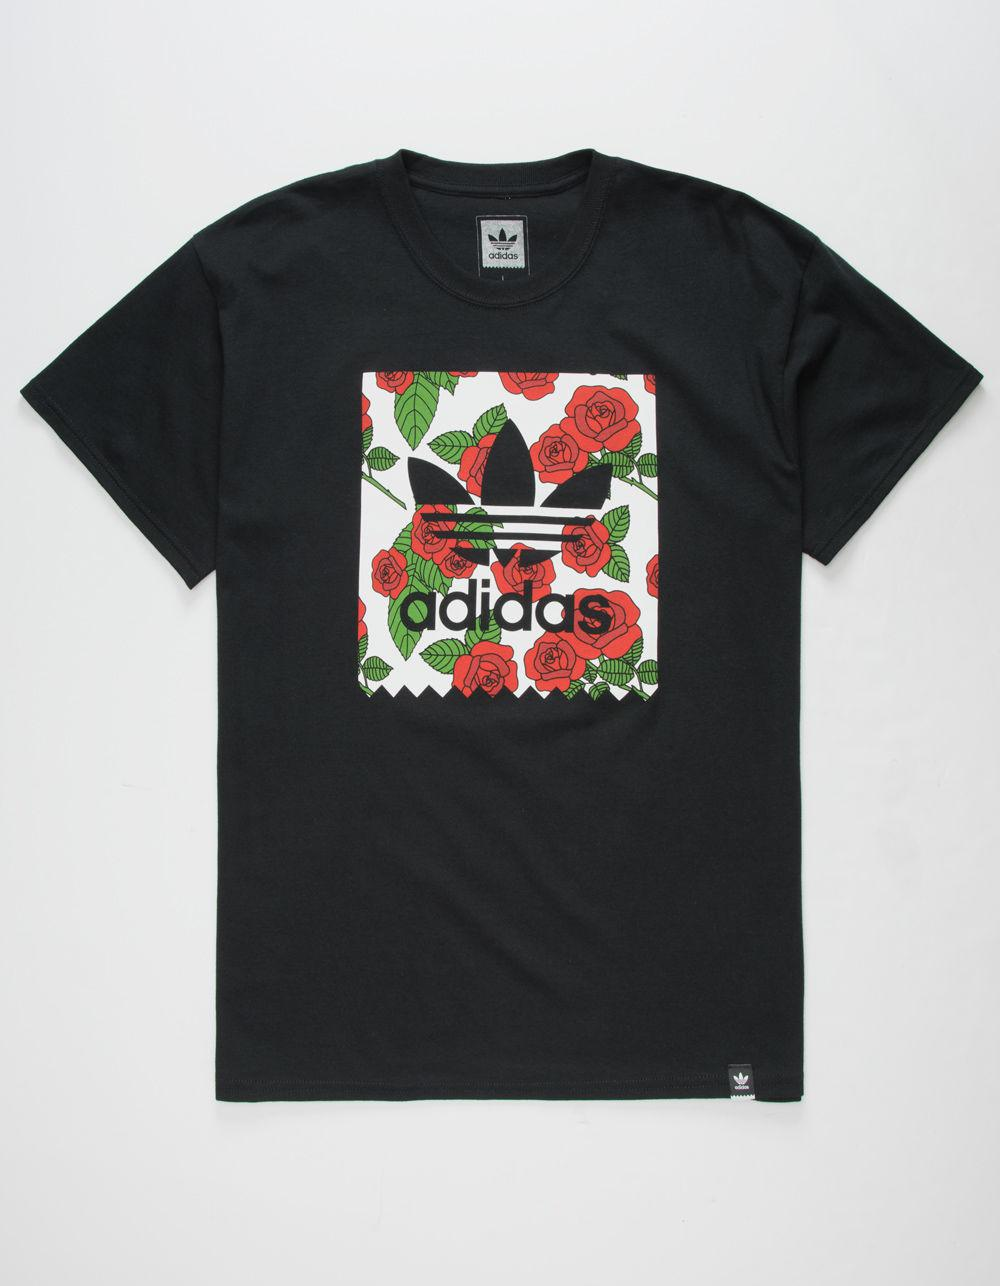 adidas shirt with roses